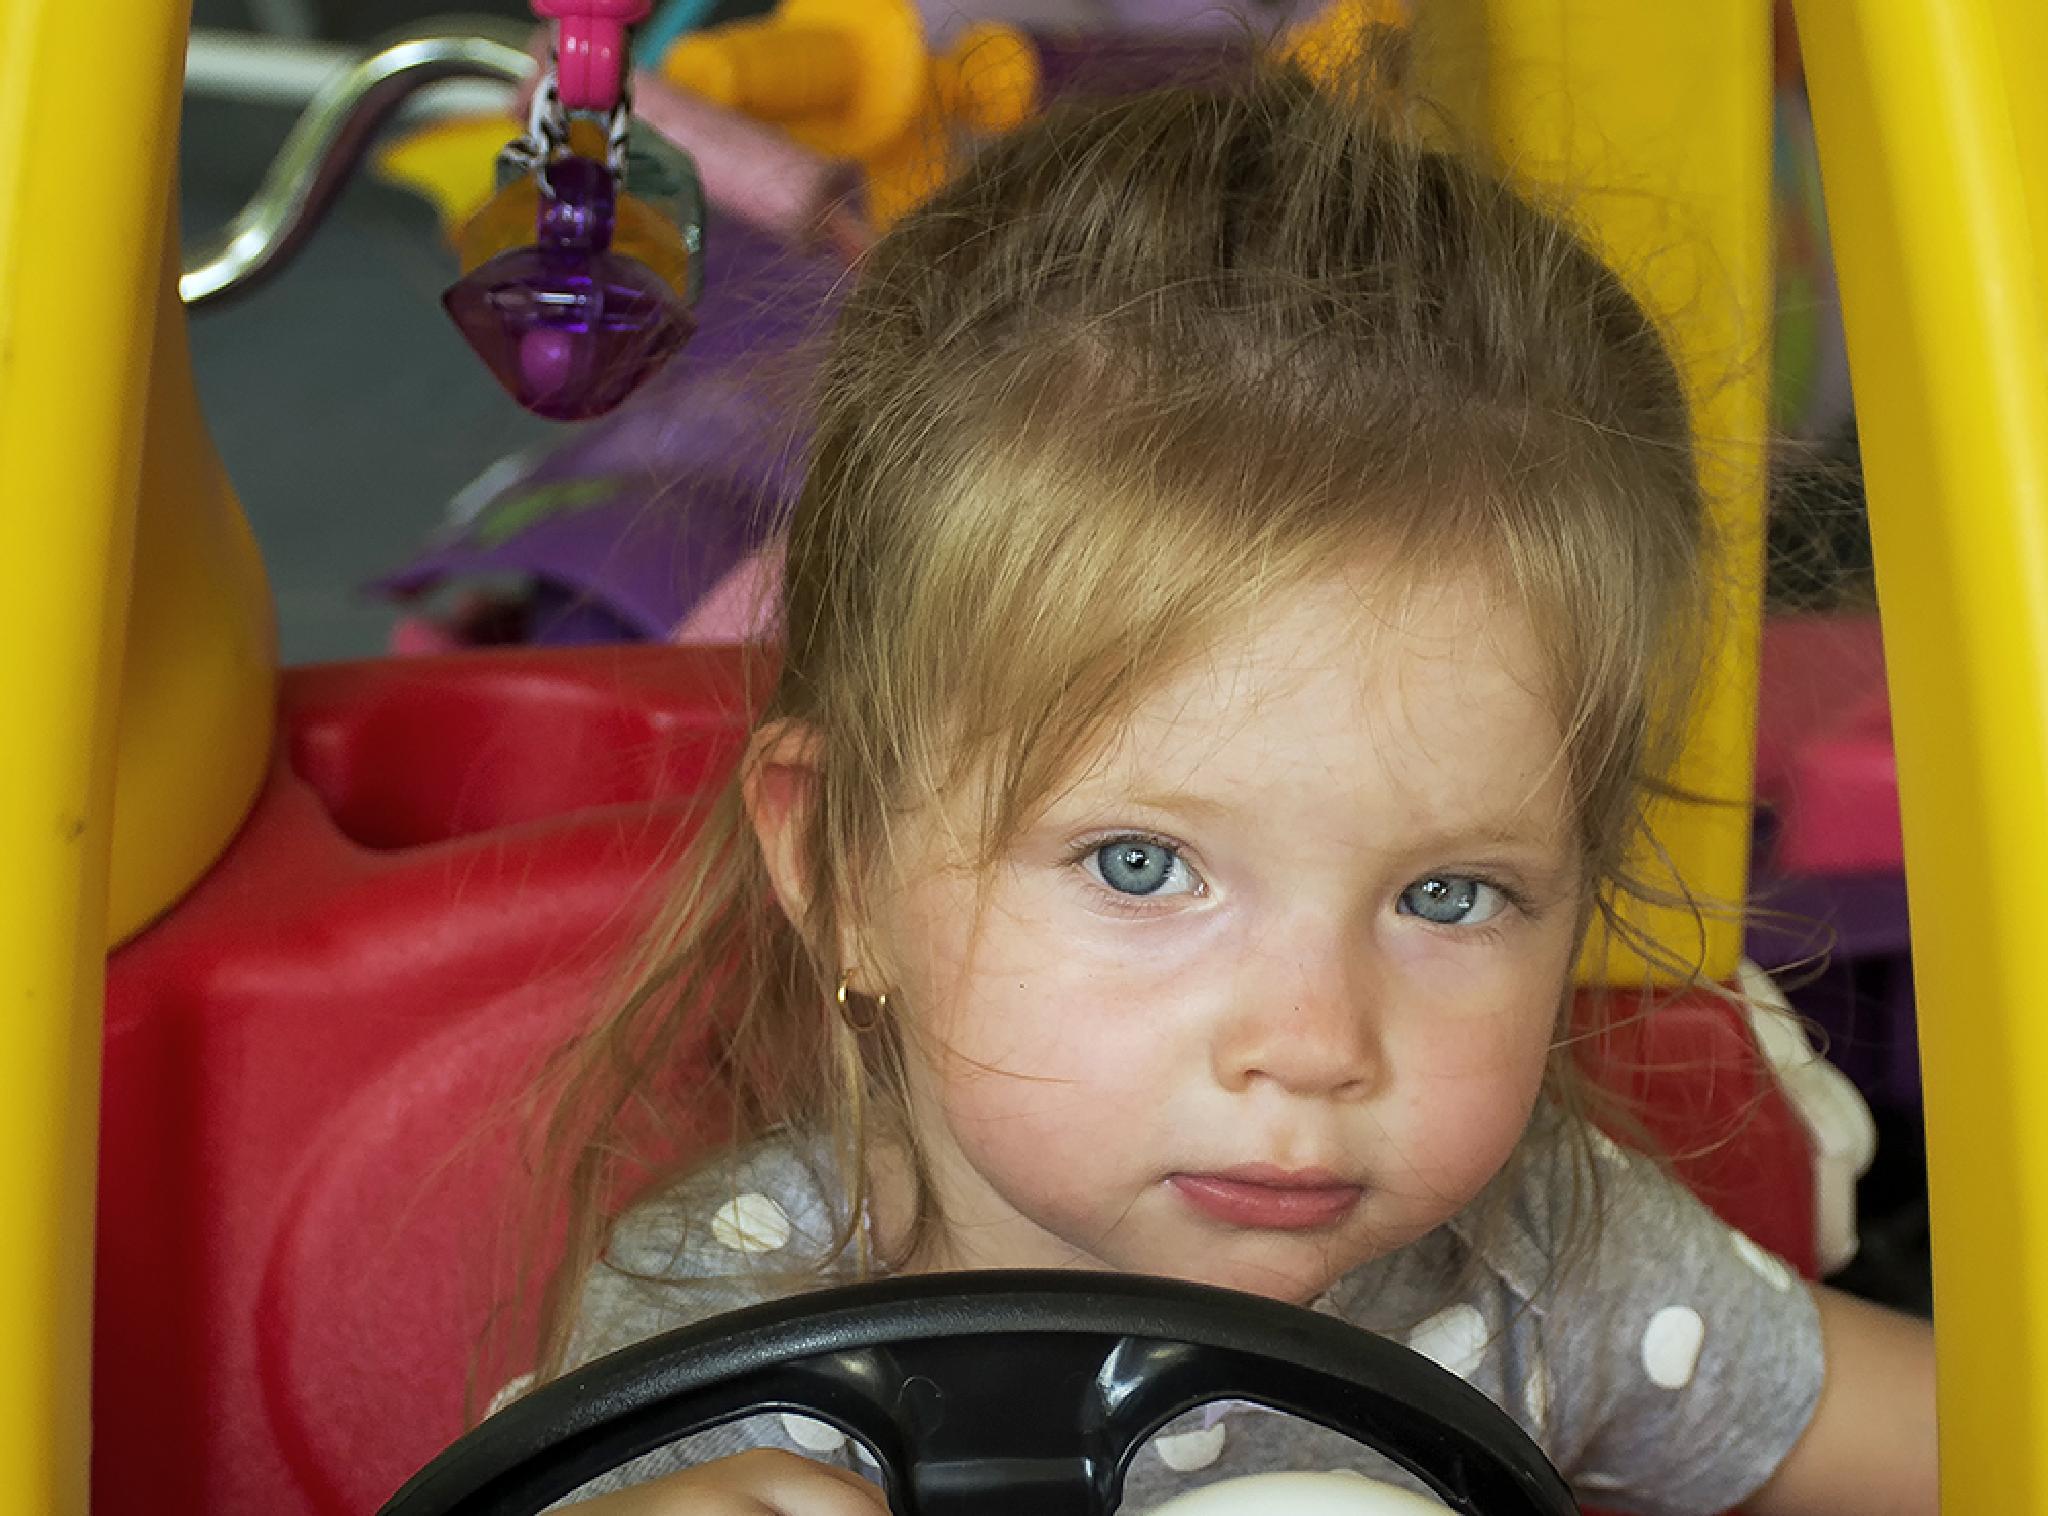 Gianna going for a drive by Joe Saladino